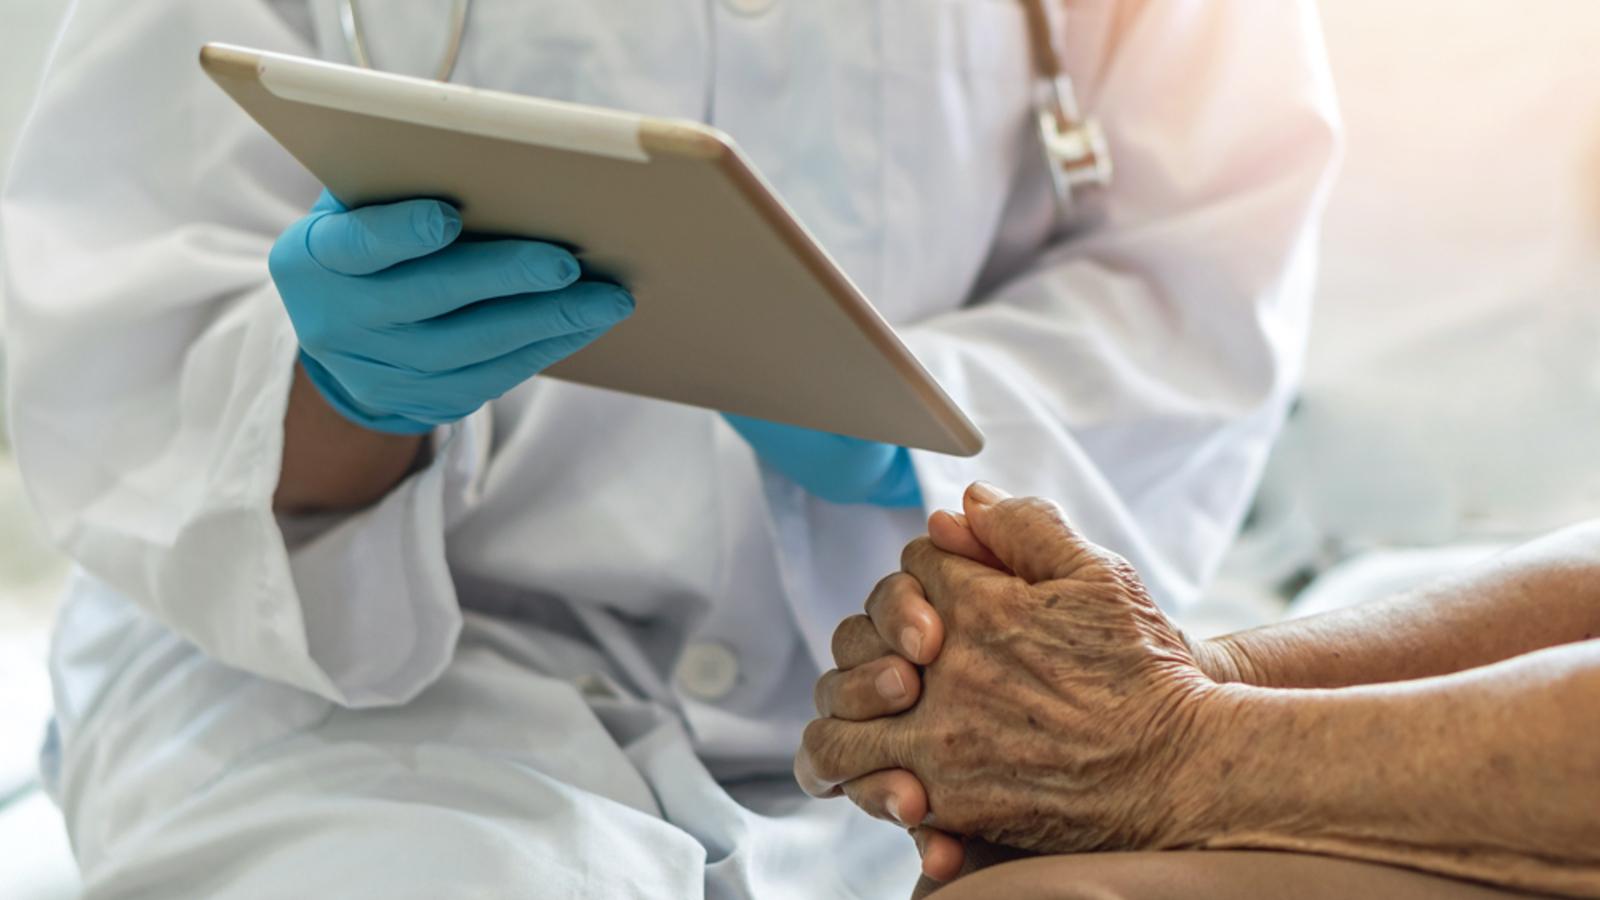 de-transparante-patient